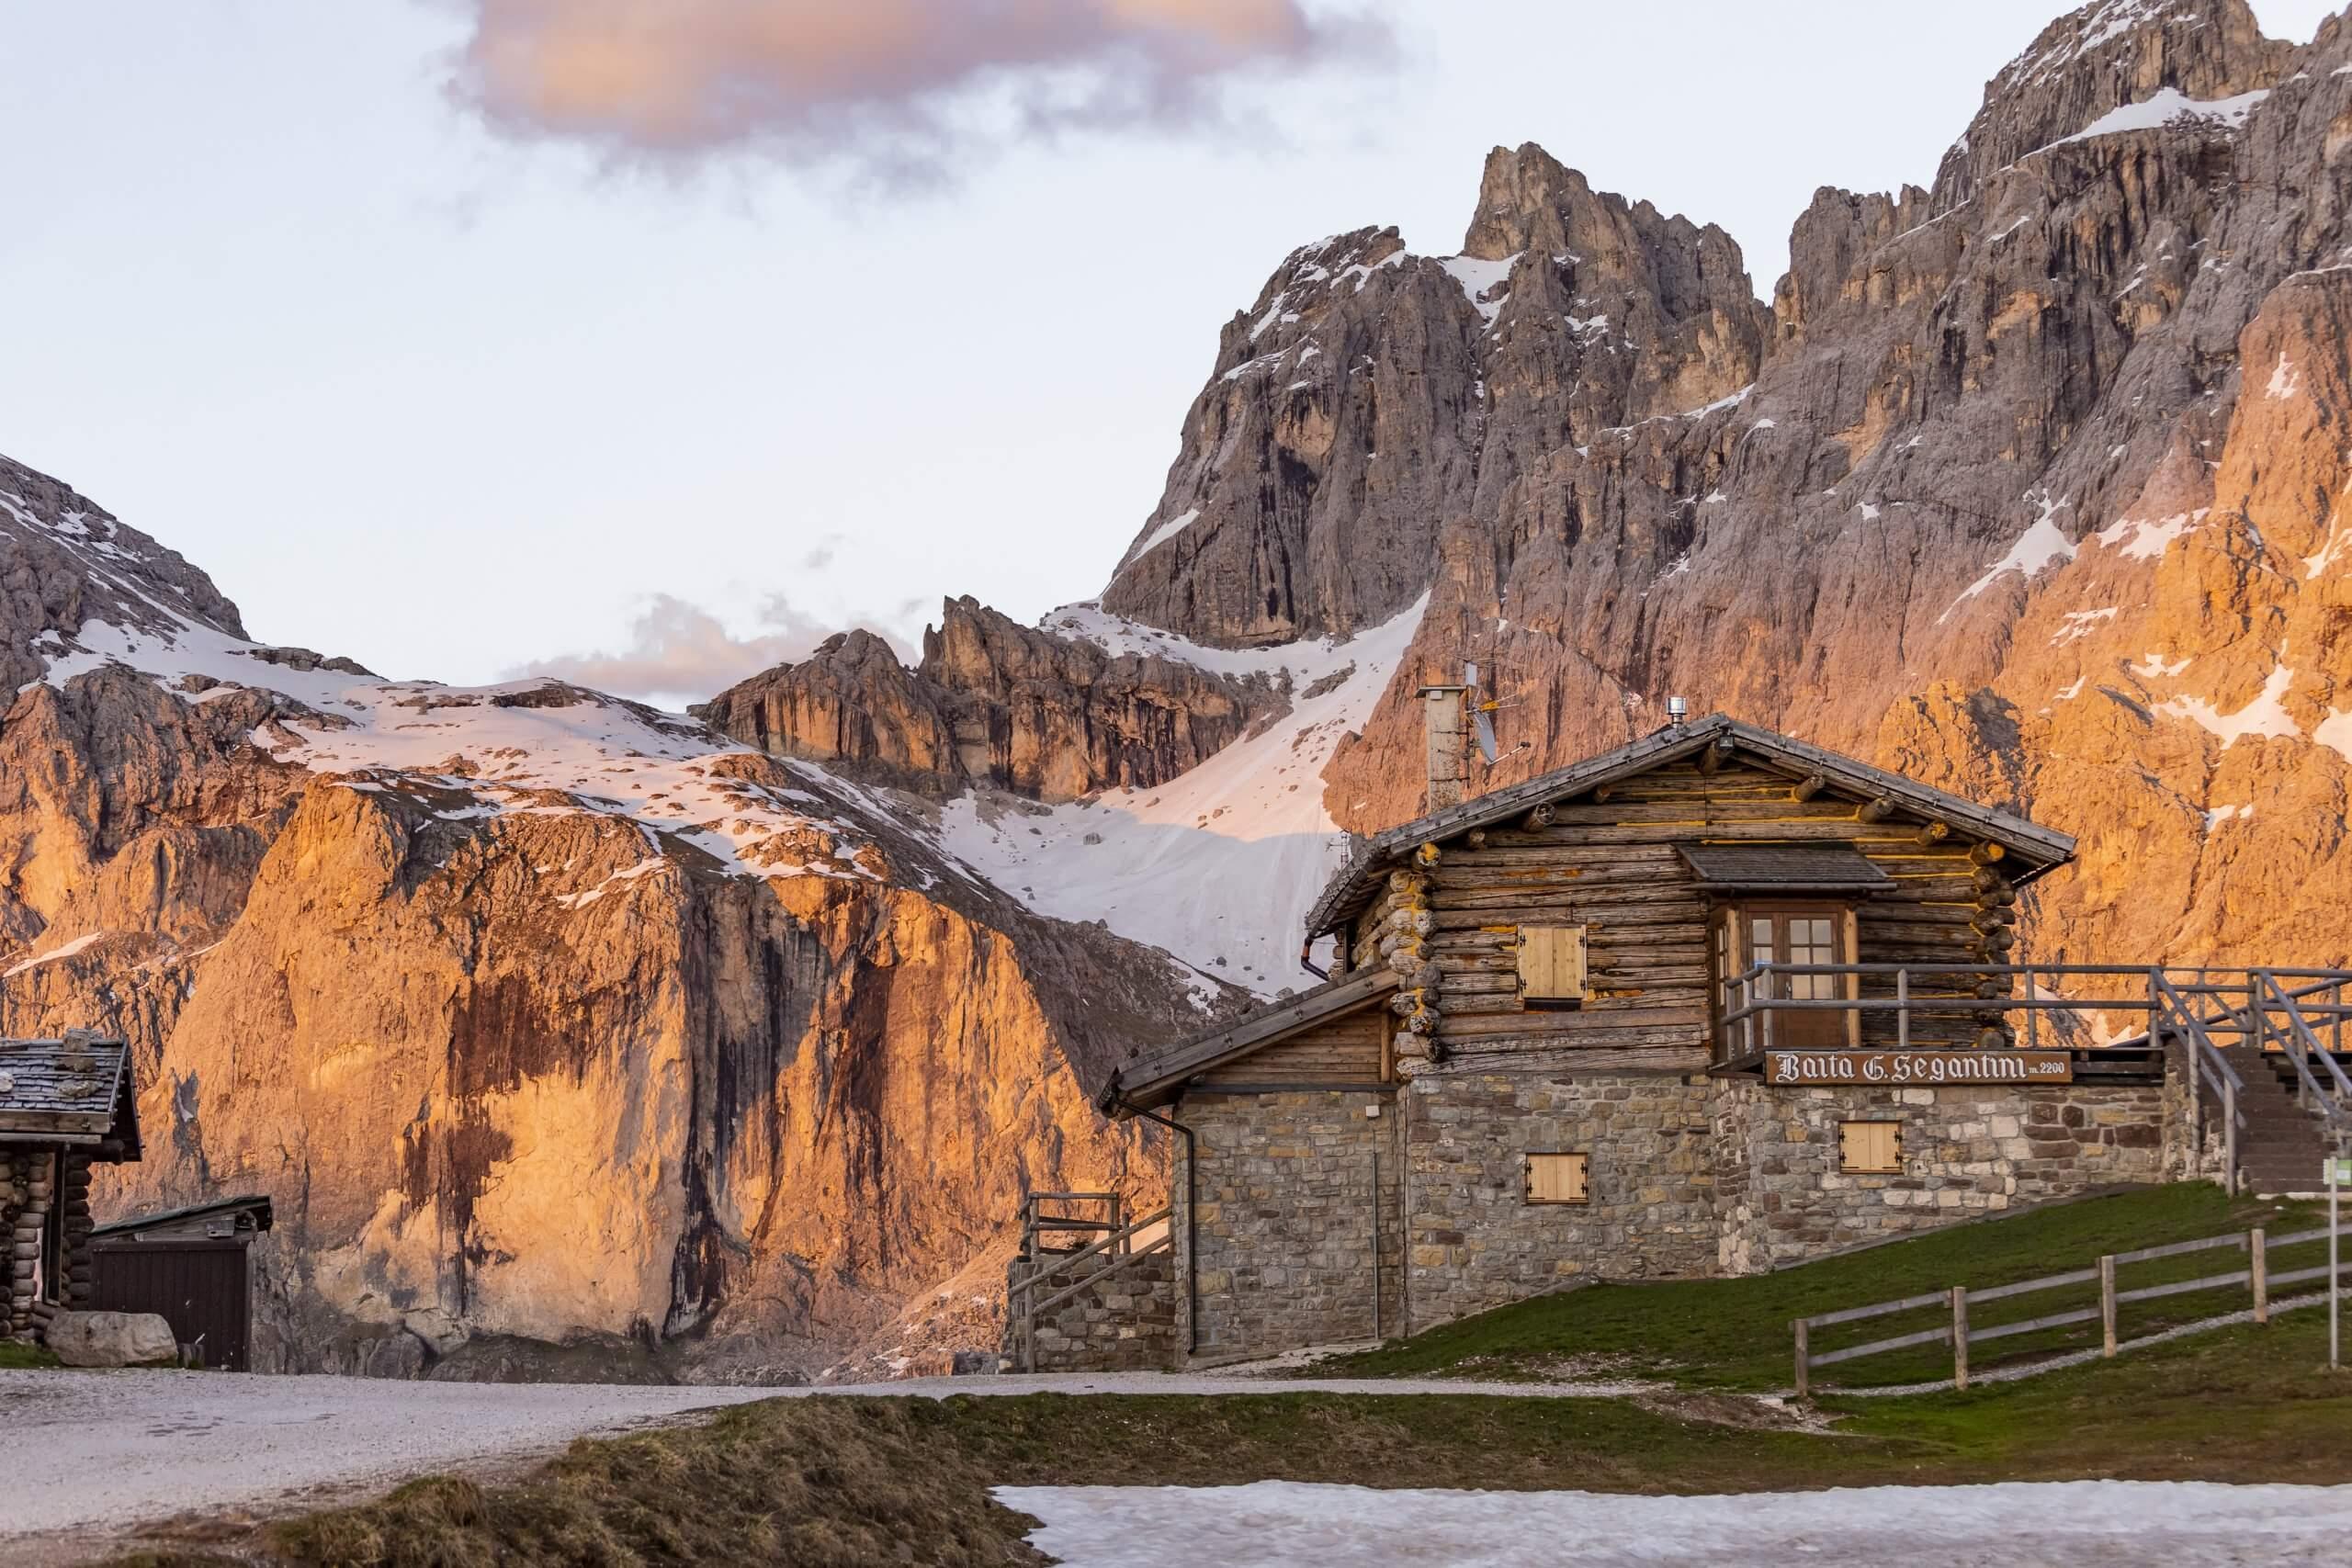 Baita Segantini - die meistfotografierte Alm im Trentino